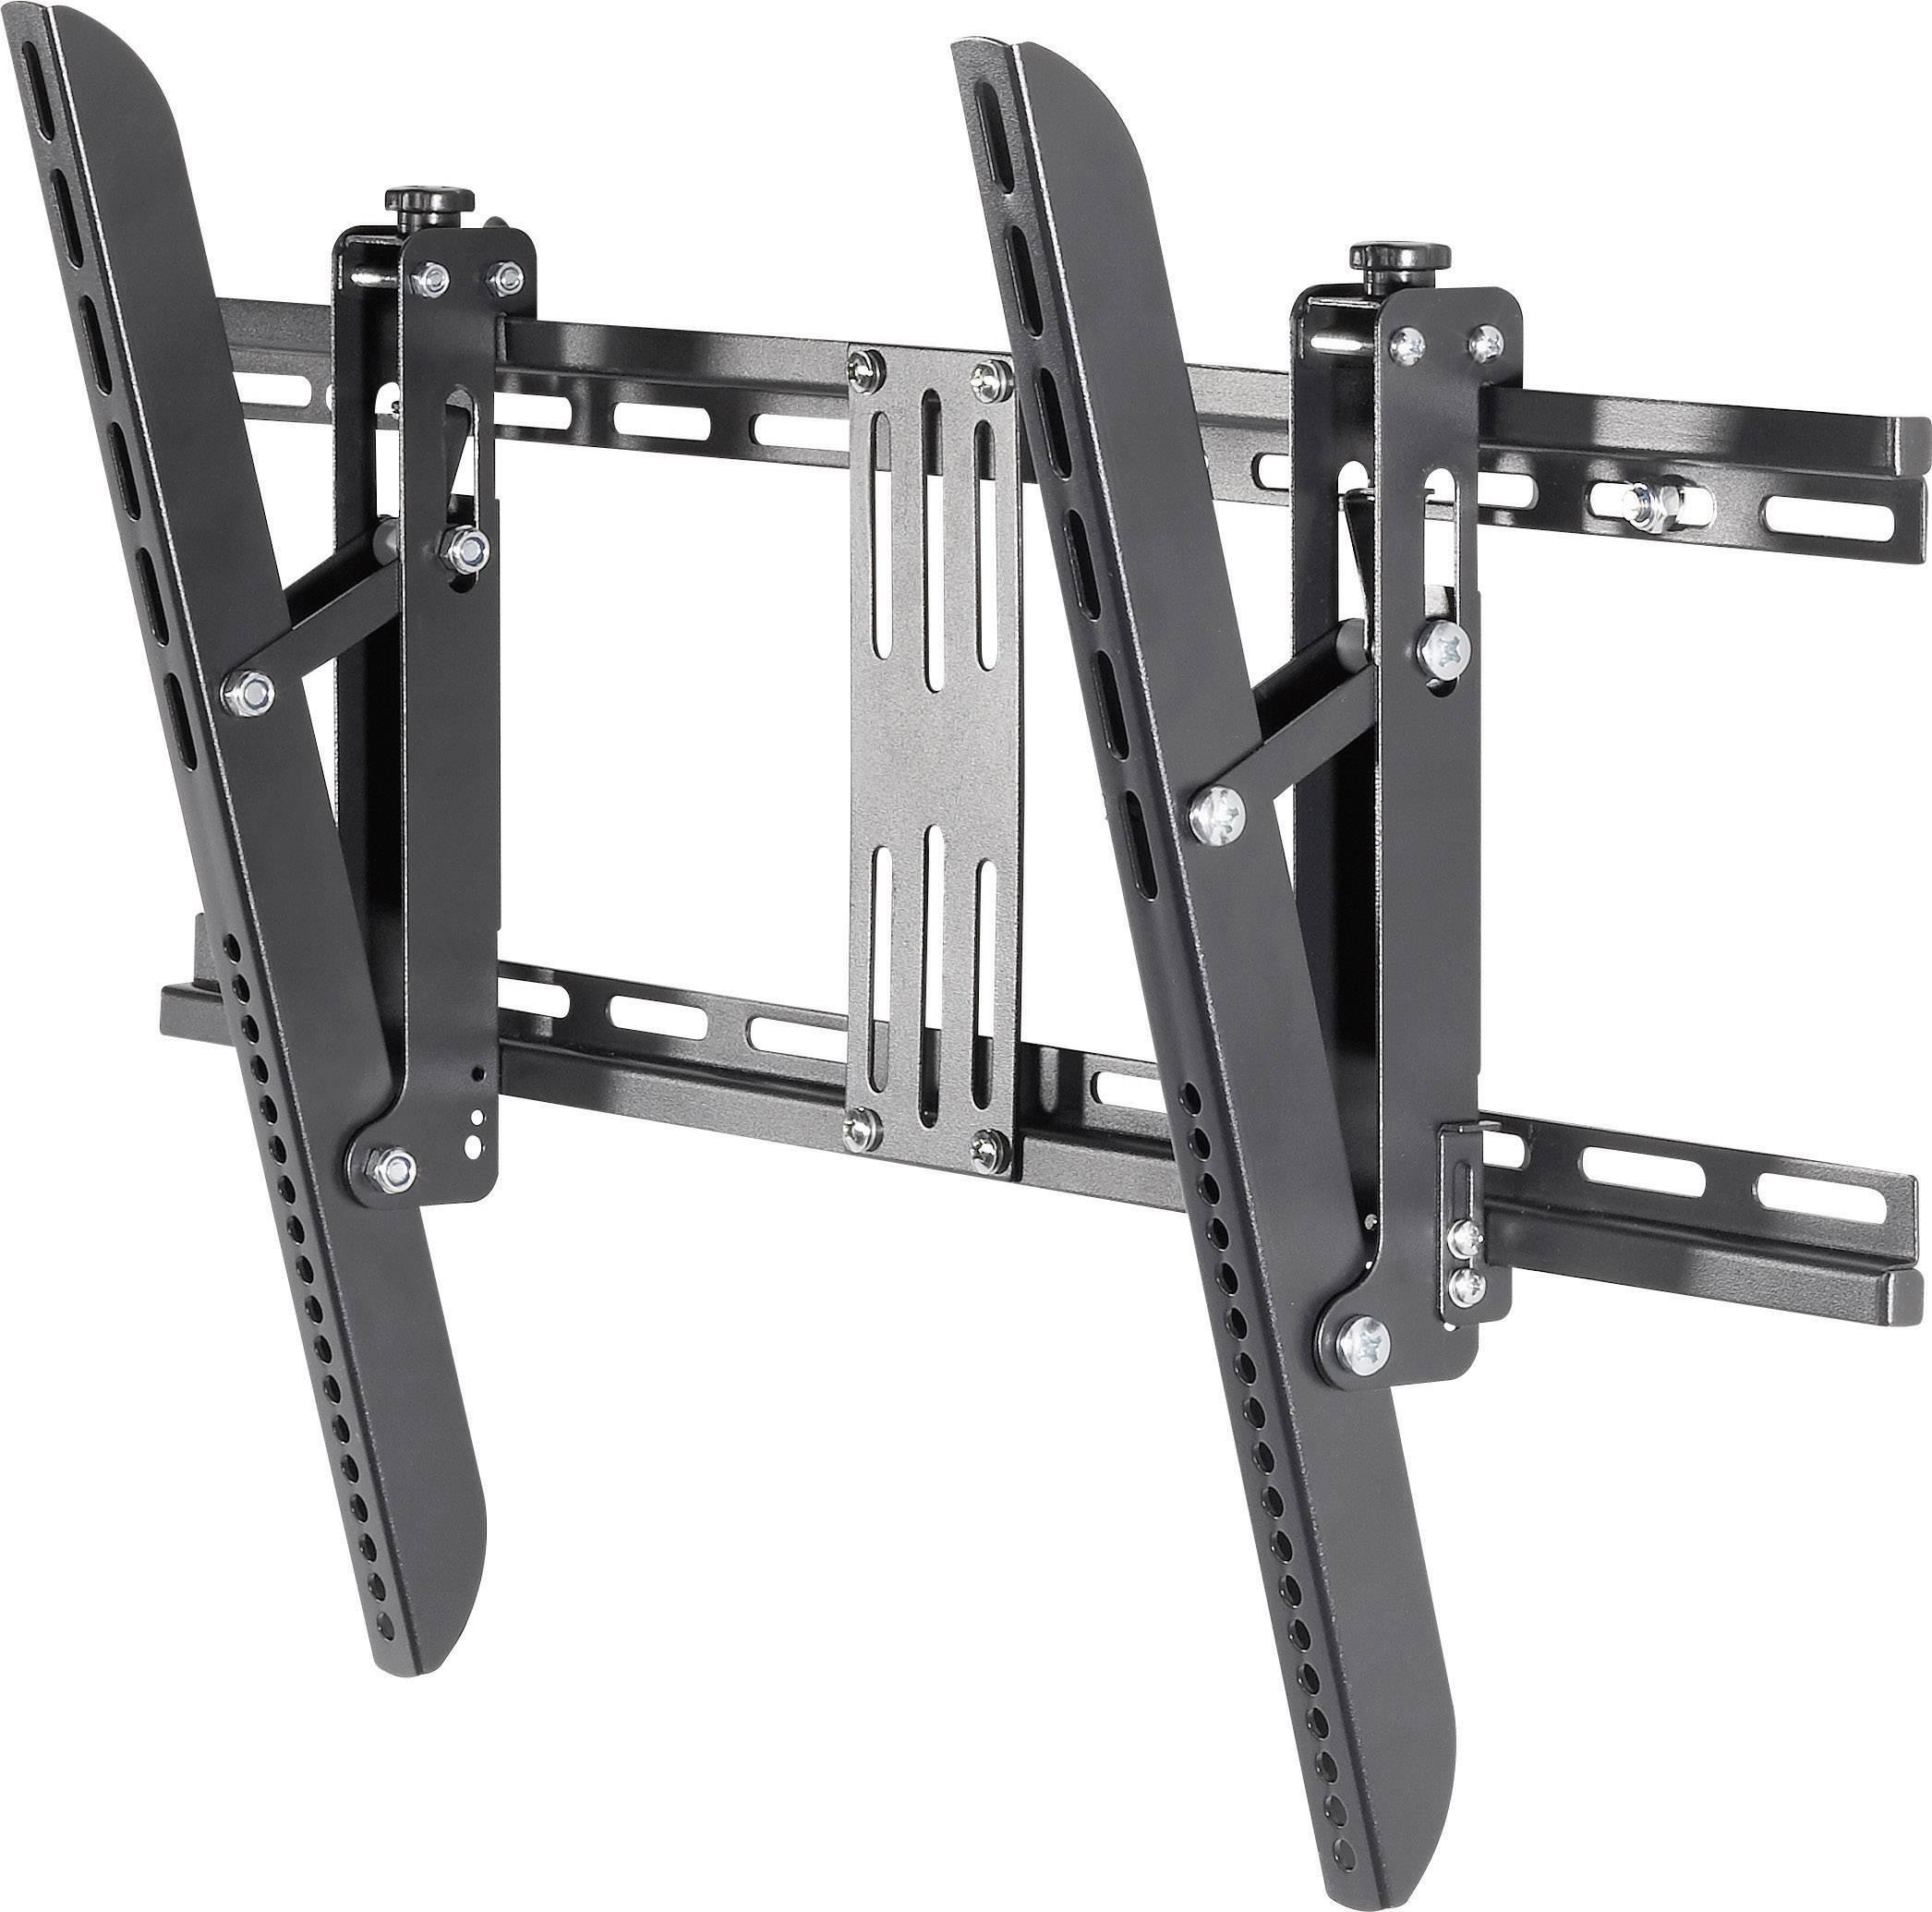 "TV držiak na stenu SpeaKa Professional 989273, sklápajúci, 81,3 cm (32"") - 160,0 cm (63"")"